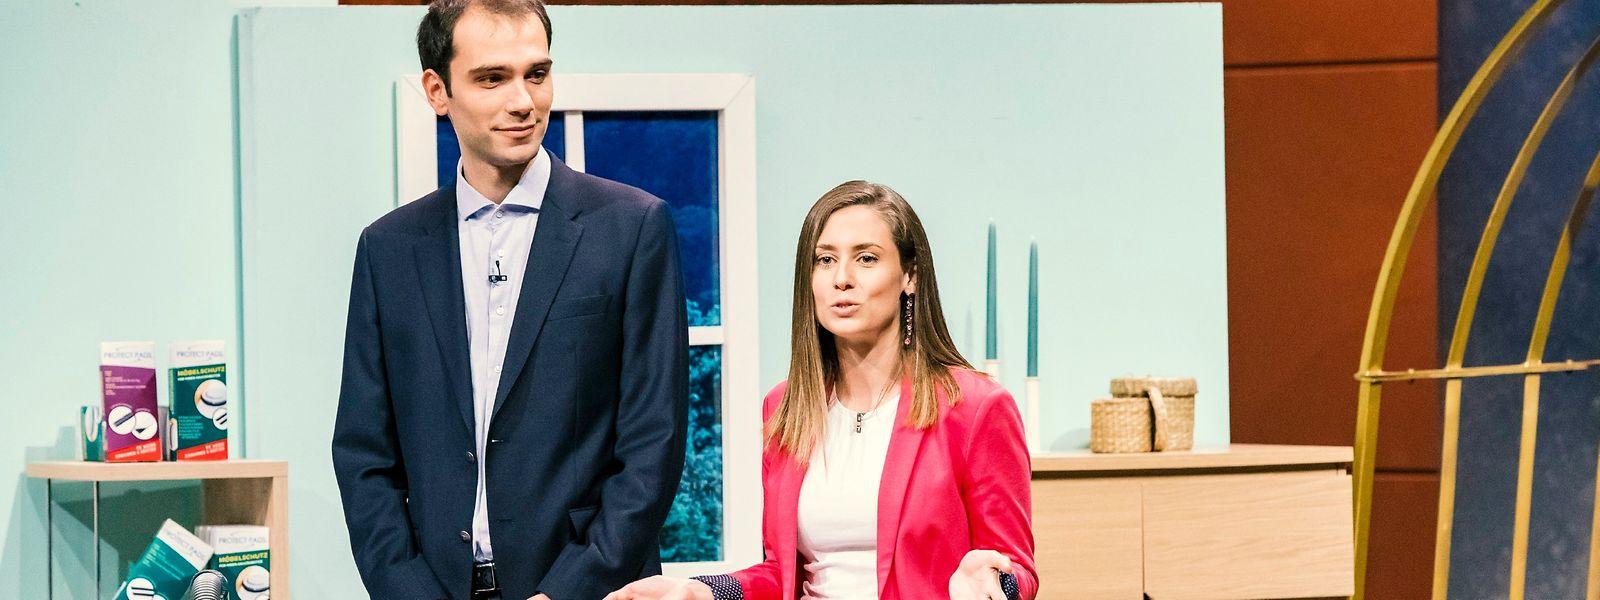 Jill Audrit und Adel Adrovic aus Luxemburg.